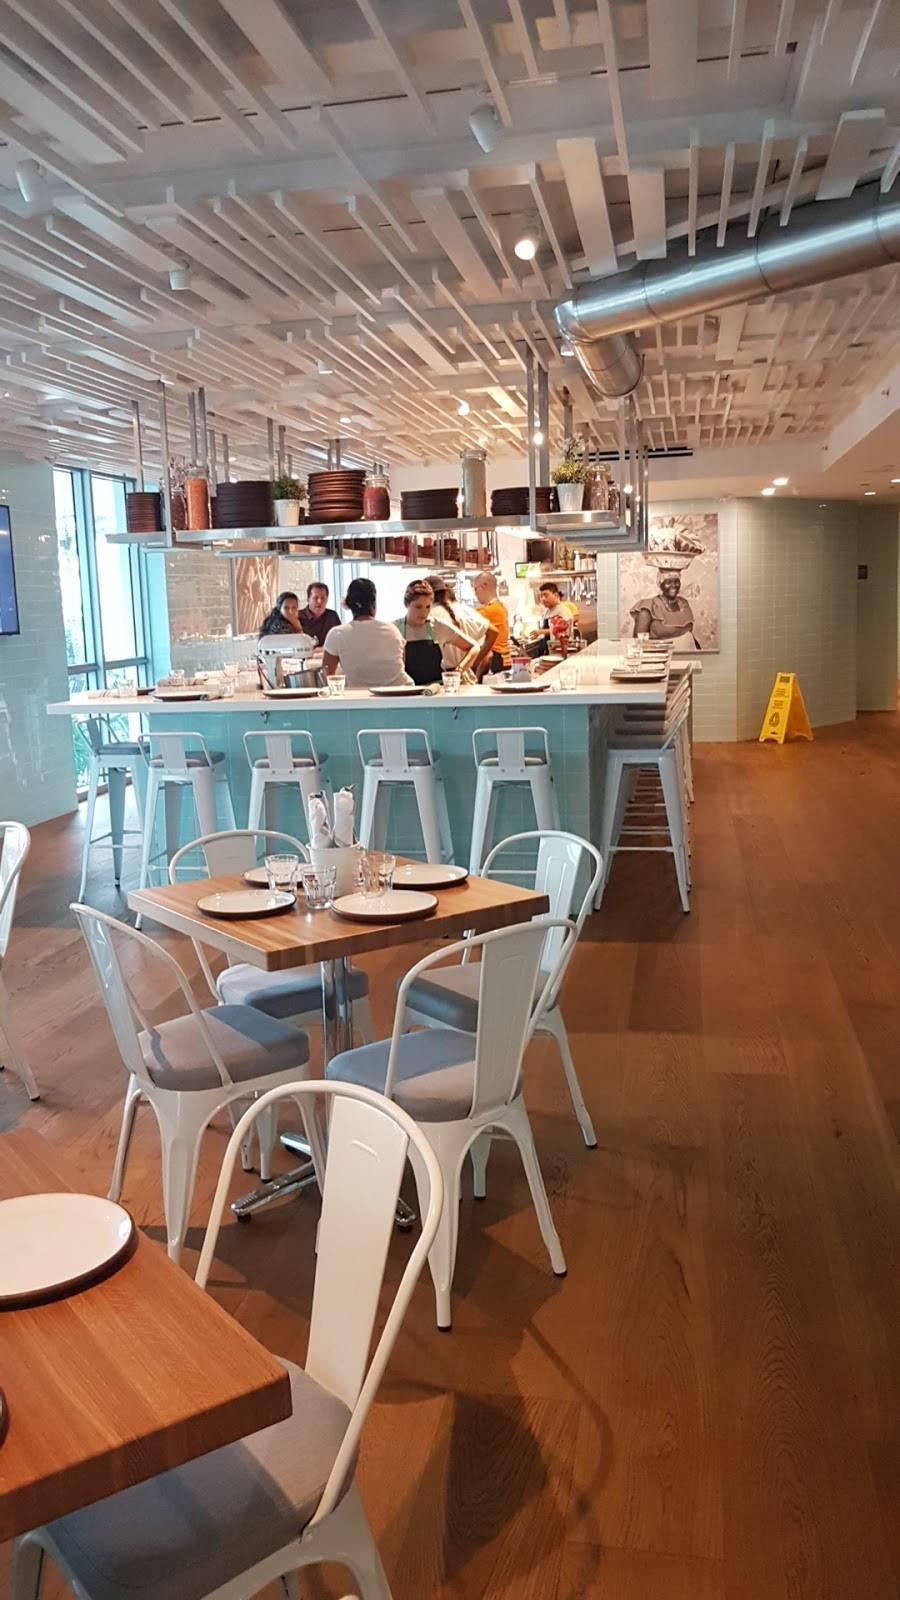 Obra Kitchen Table Restaurant 1331 Brickell Bay Dr Miami Fl 33131 Usa